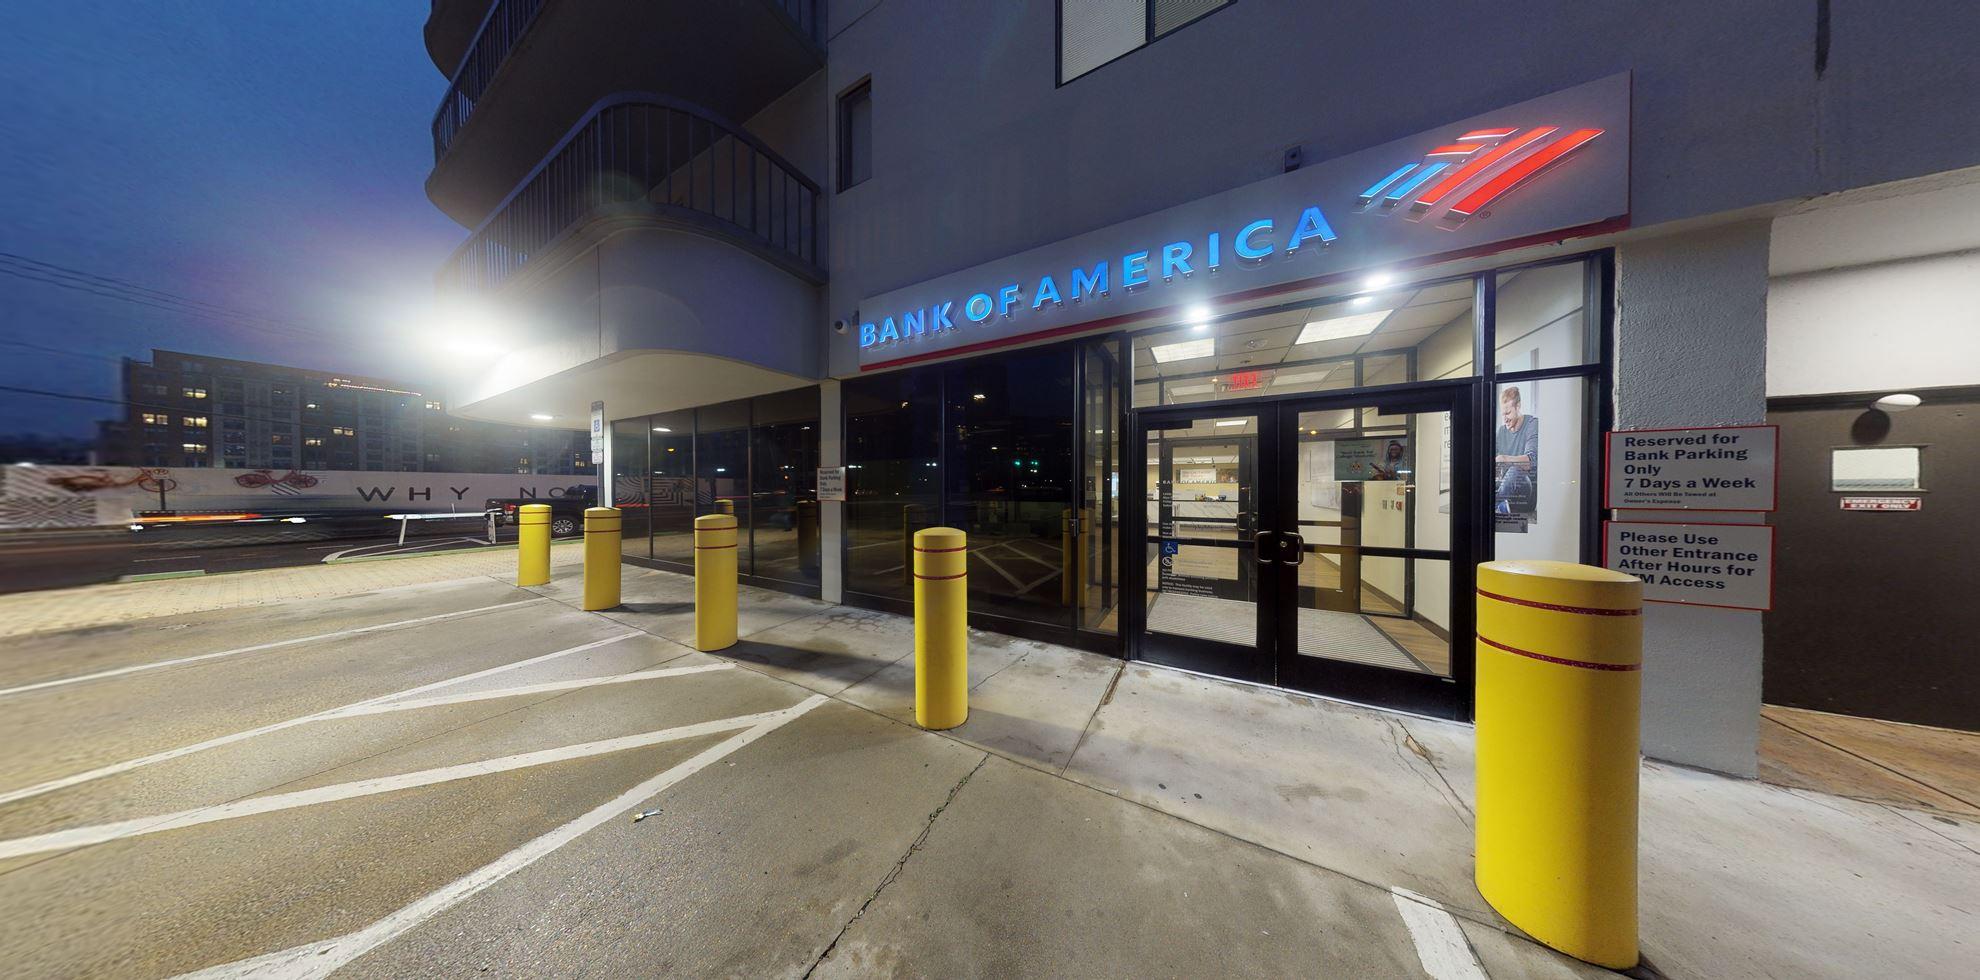 Bank of America financial center with walk-up ATM   1425 S Eads St STE 1, Arlington, VA 22202